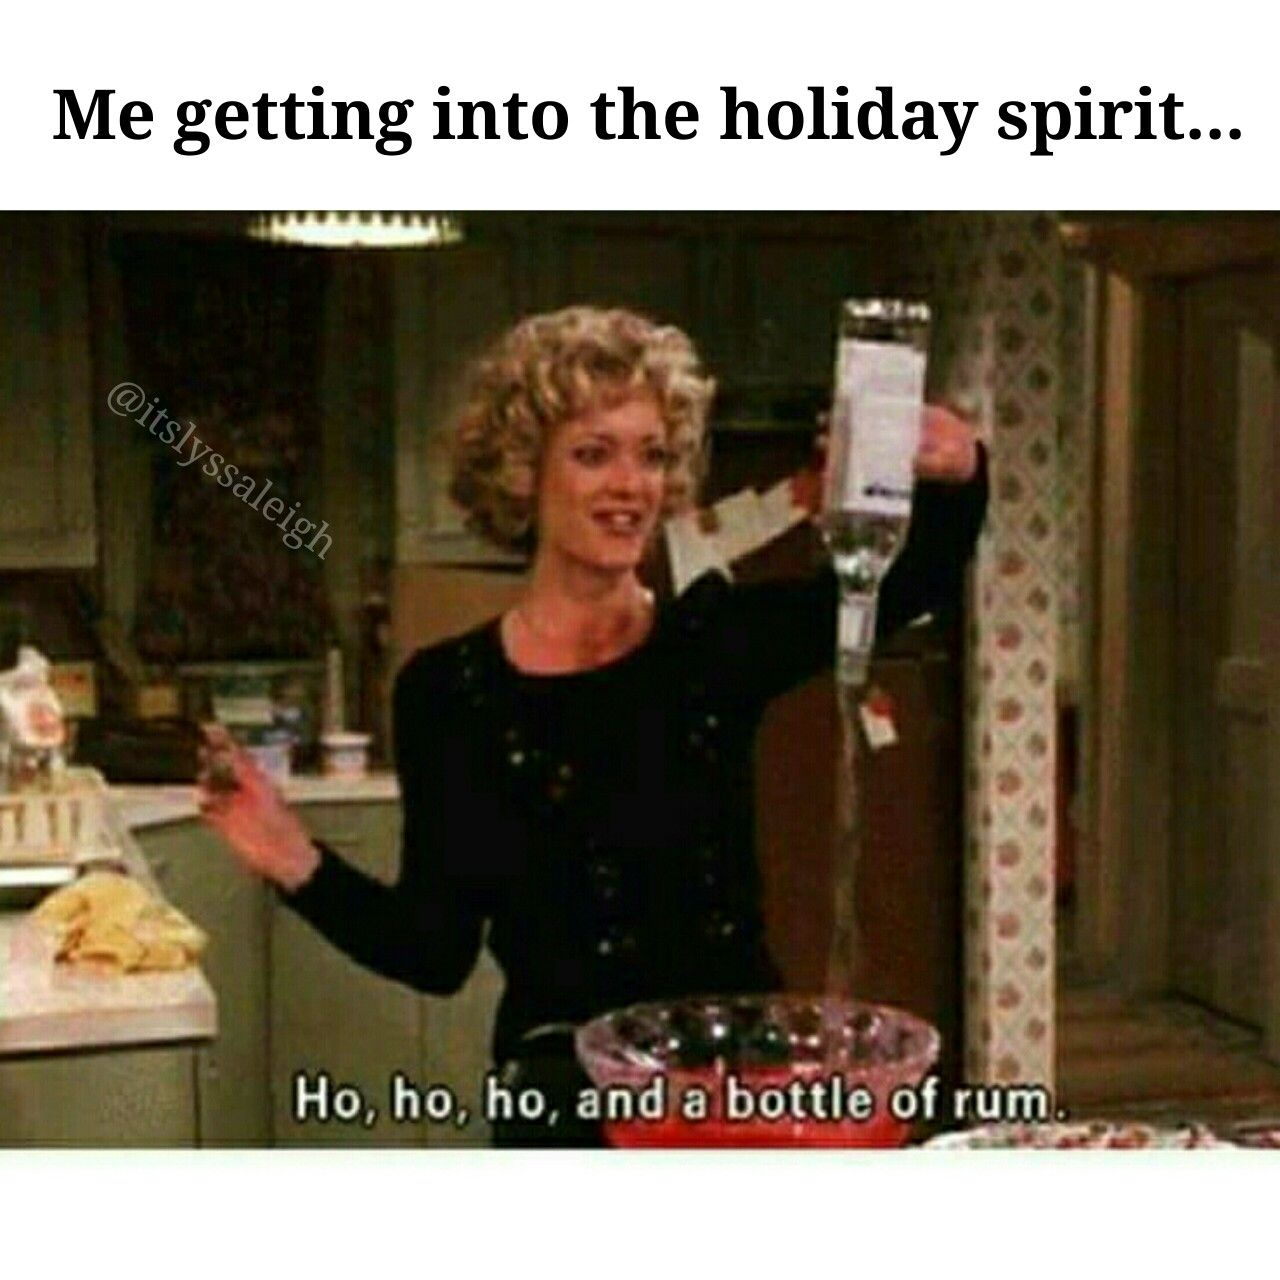 Meme Merrychristmas Memes Sorrynotsorry Jokesfordays Alc Christmas Memes Funny Christmas Humor Christmas Memes